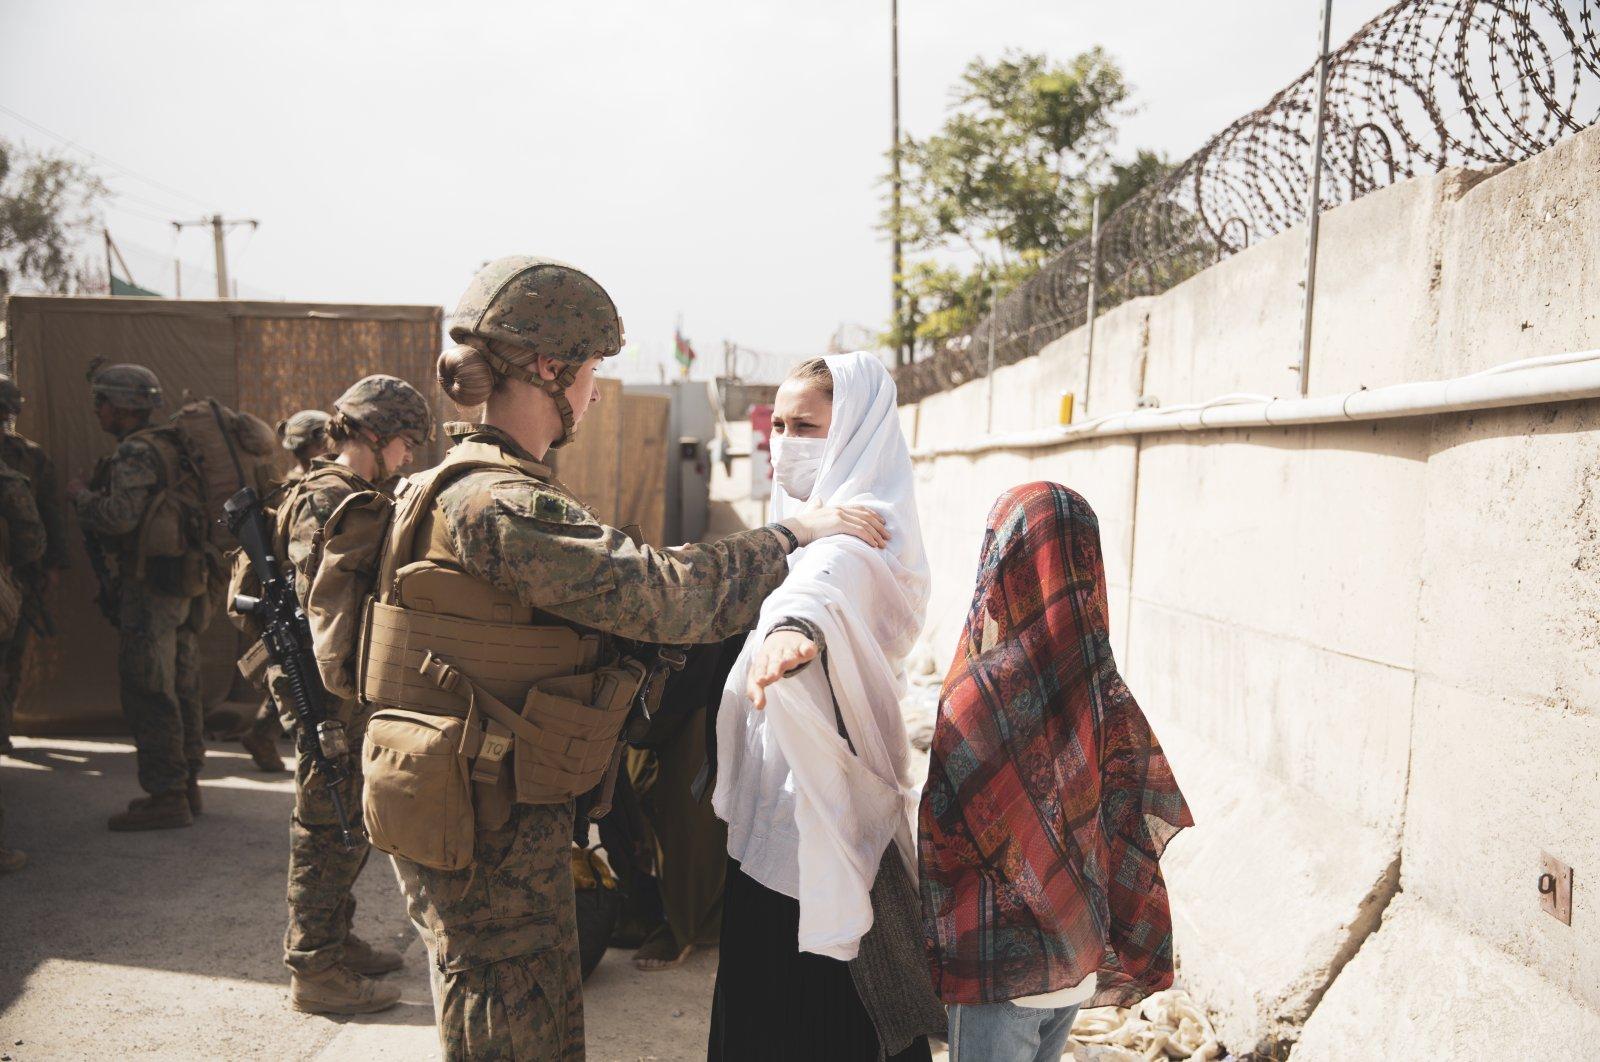 A Marine checks two civilians during processing through an Evacuee Control Checkpoint (ECC) during an evacuation at Hamid Karzai International Airport, Kabul, Afghanistan, Aug. 18, 2021. (U.S. Marine Corps photo via EPA)